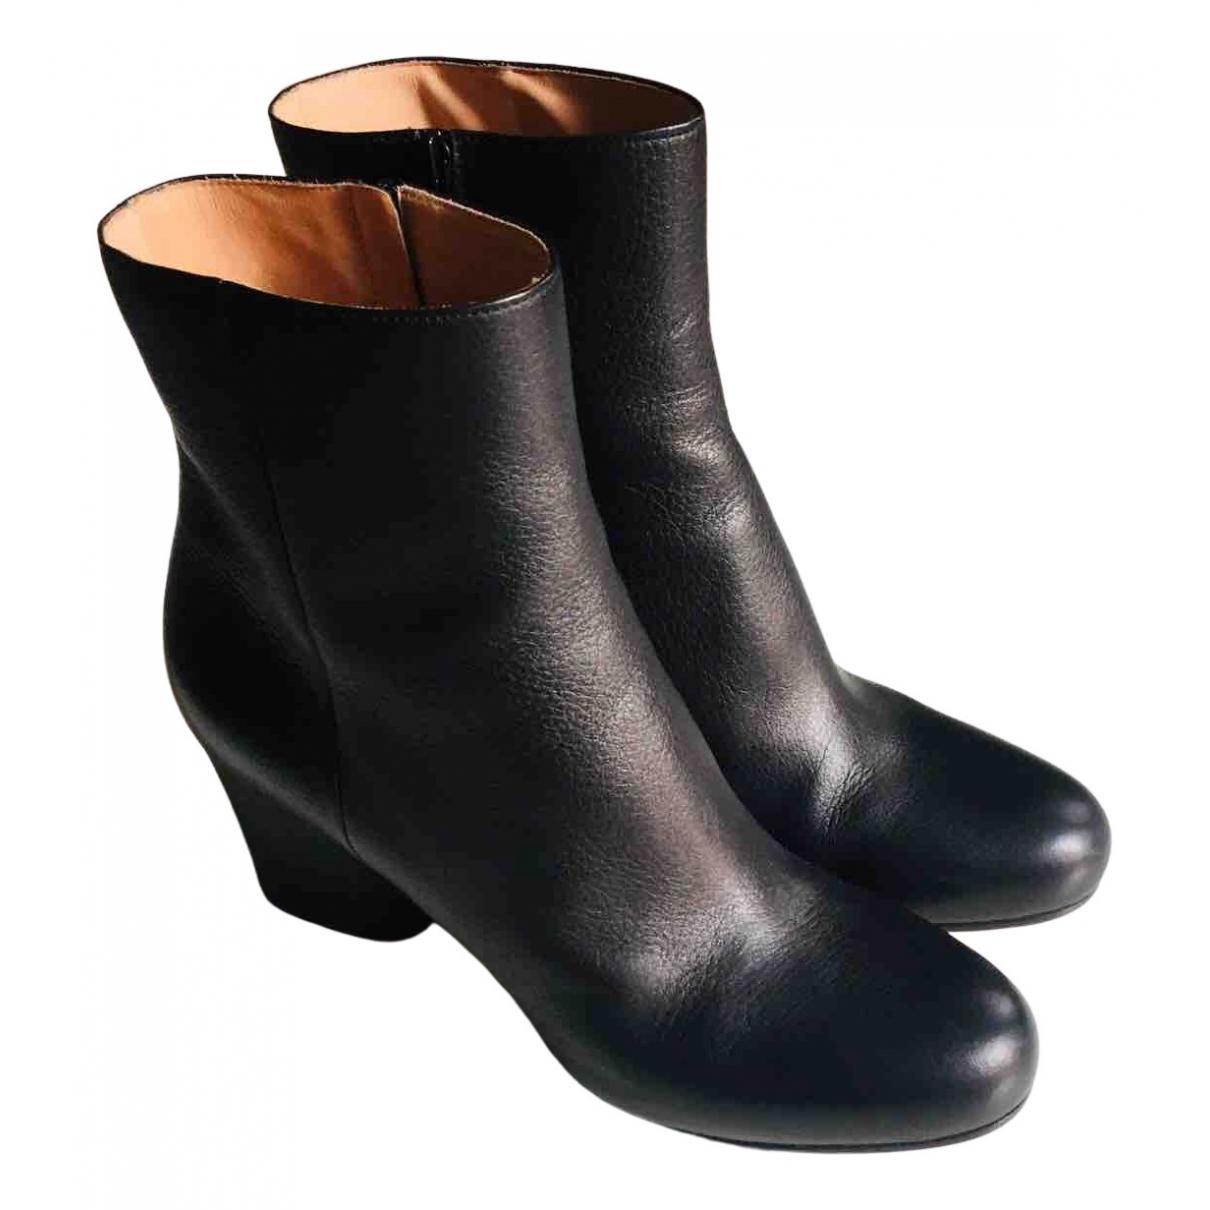 Maison Martin Margiela N Black Leather Ankle boots for Women 39 EU